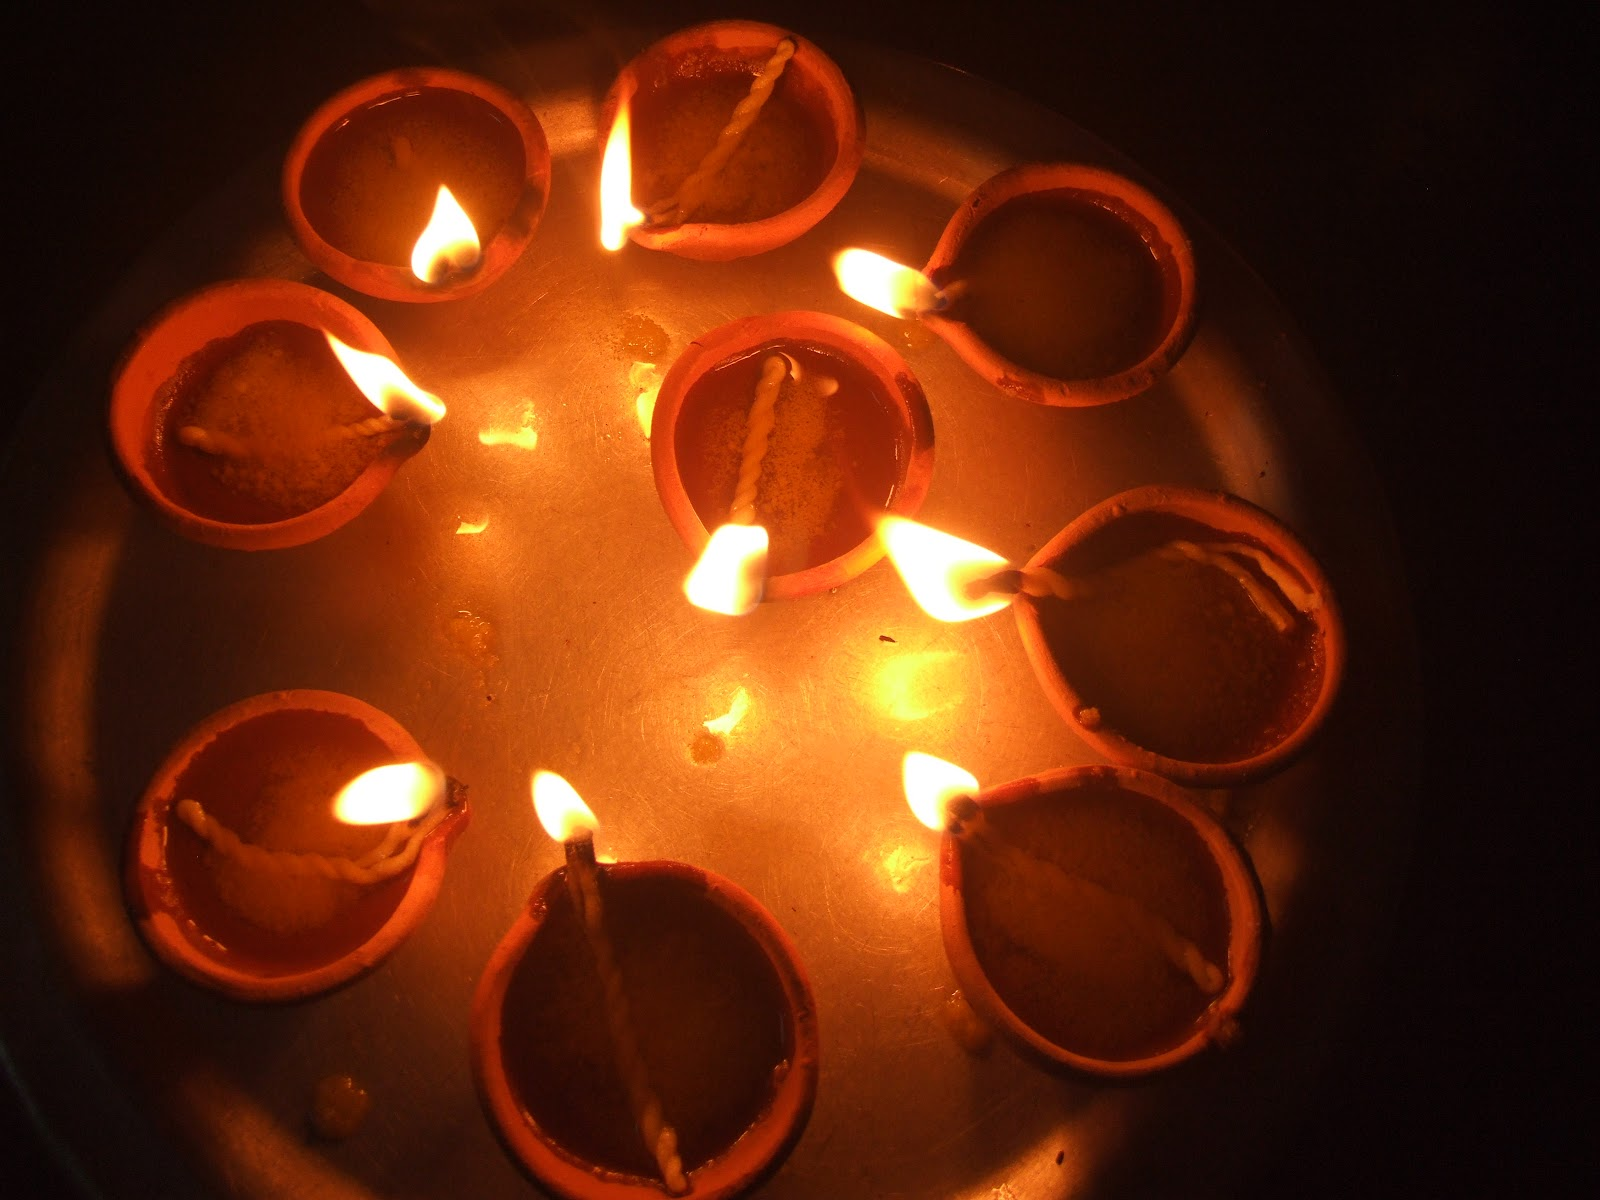 Karthigai Vilakkeedu: Devotional Lighting of Lamps of Purity on the ... for lighting lamps in temple  150ifm